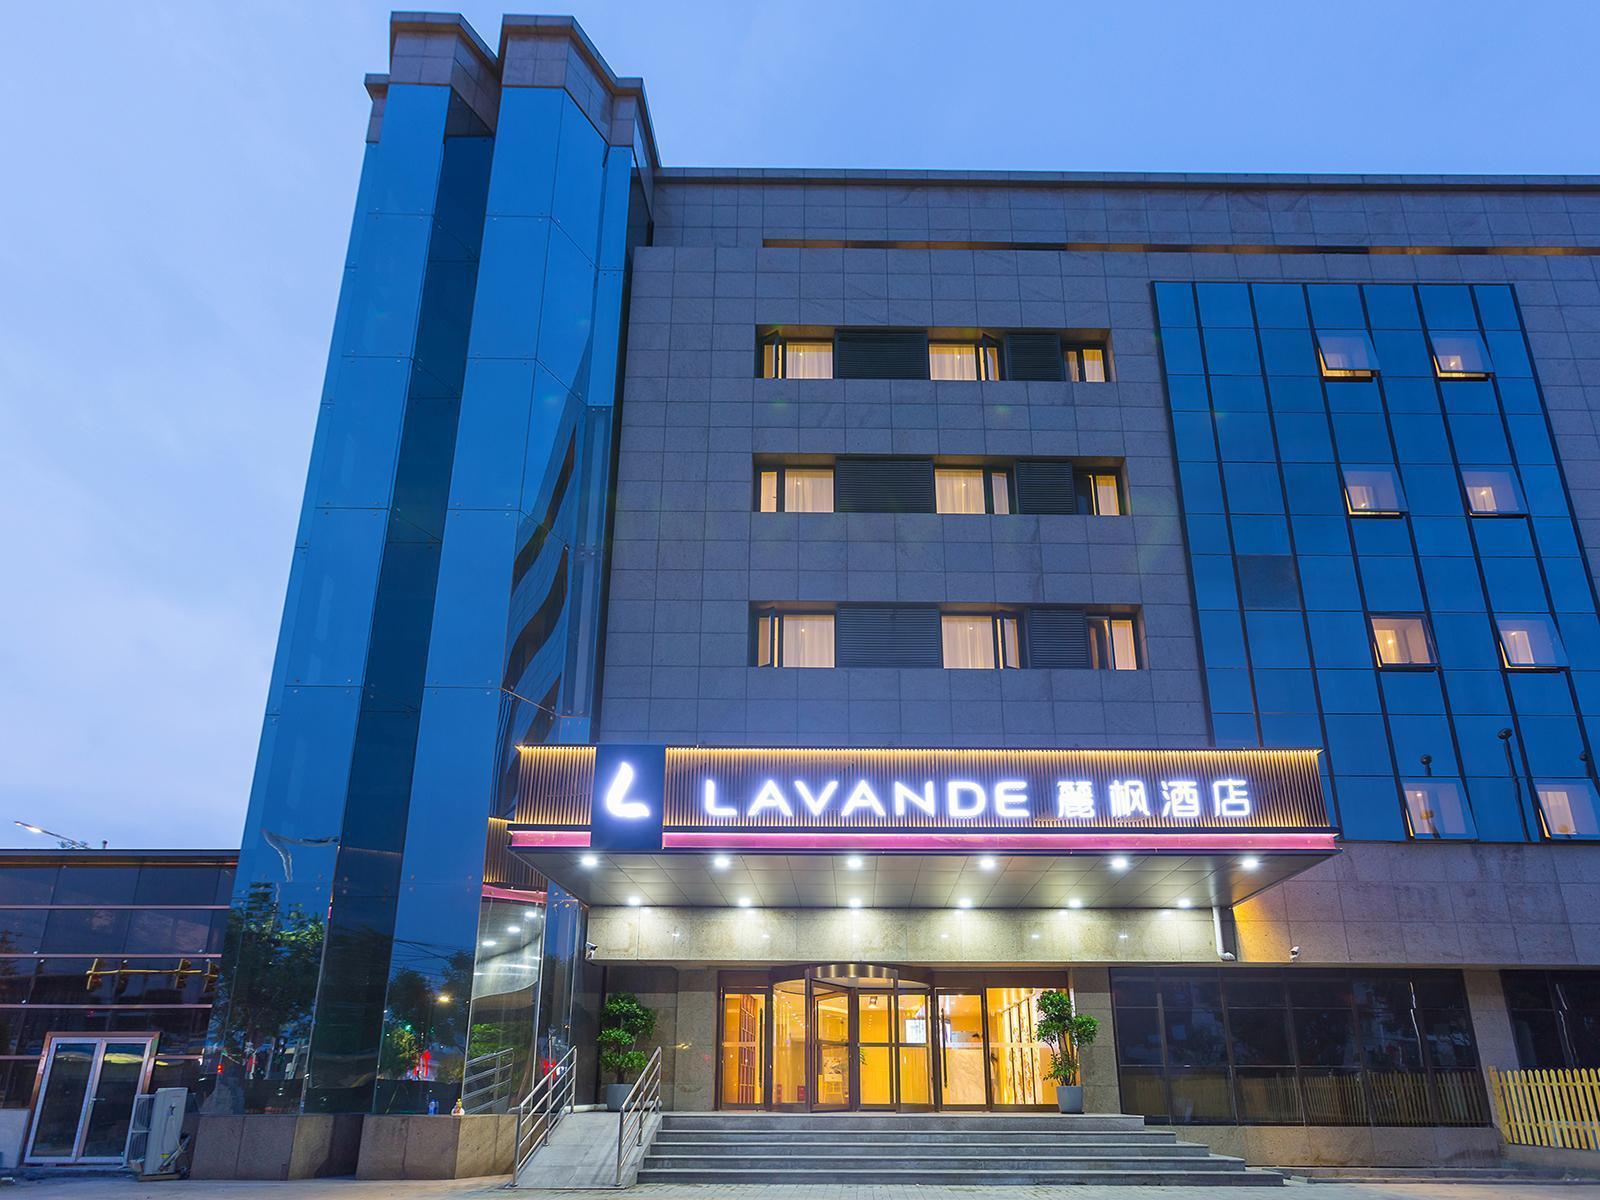 Lavande Hotels Tongzhou Beiguan Metro Station